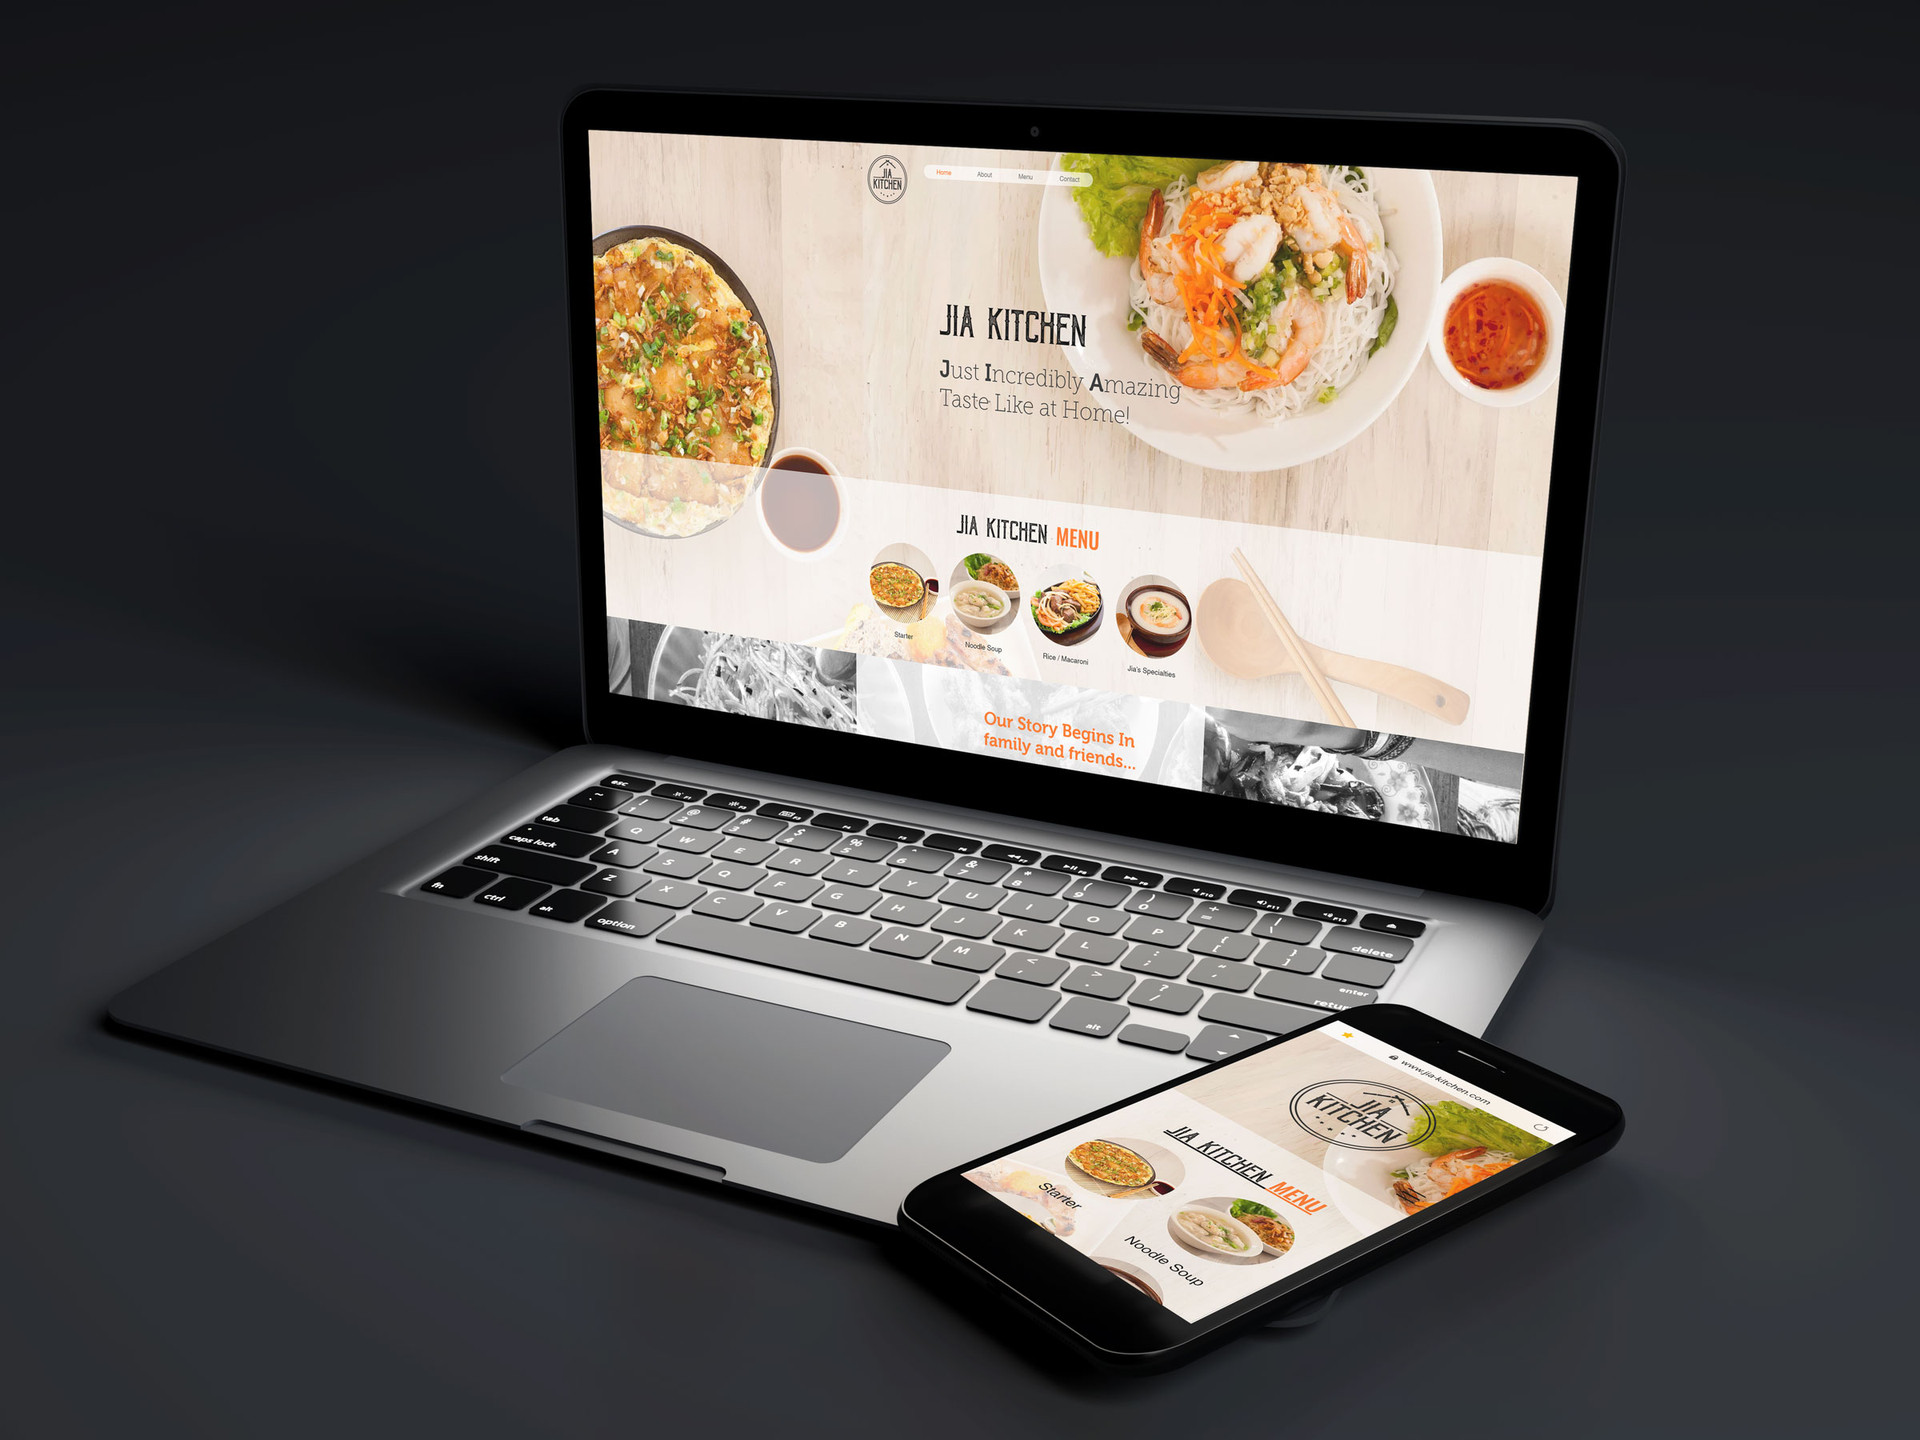 JIA Kitchen